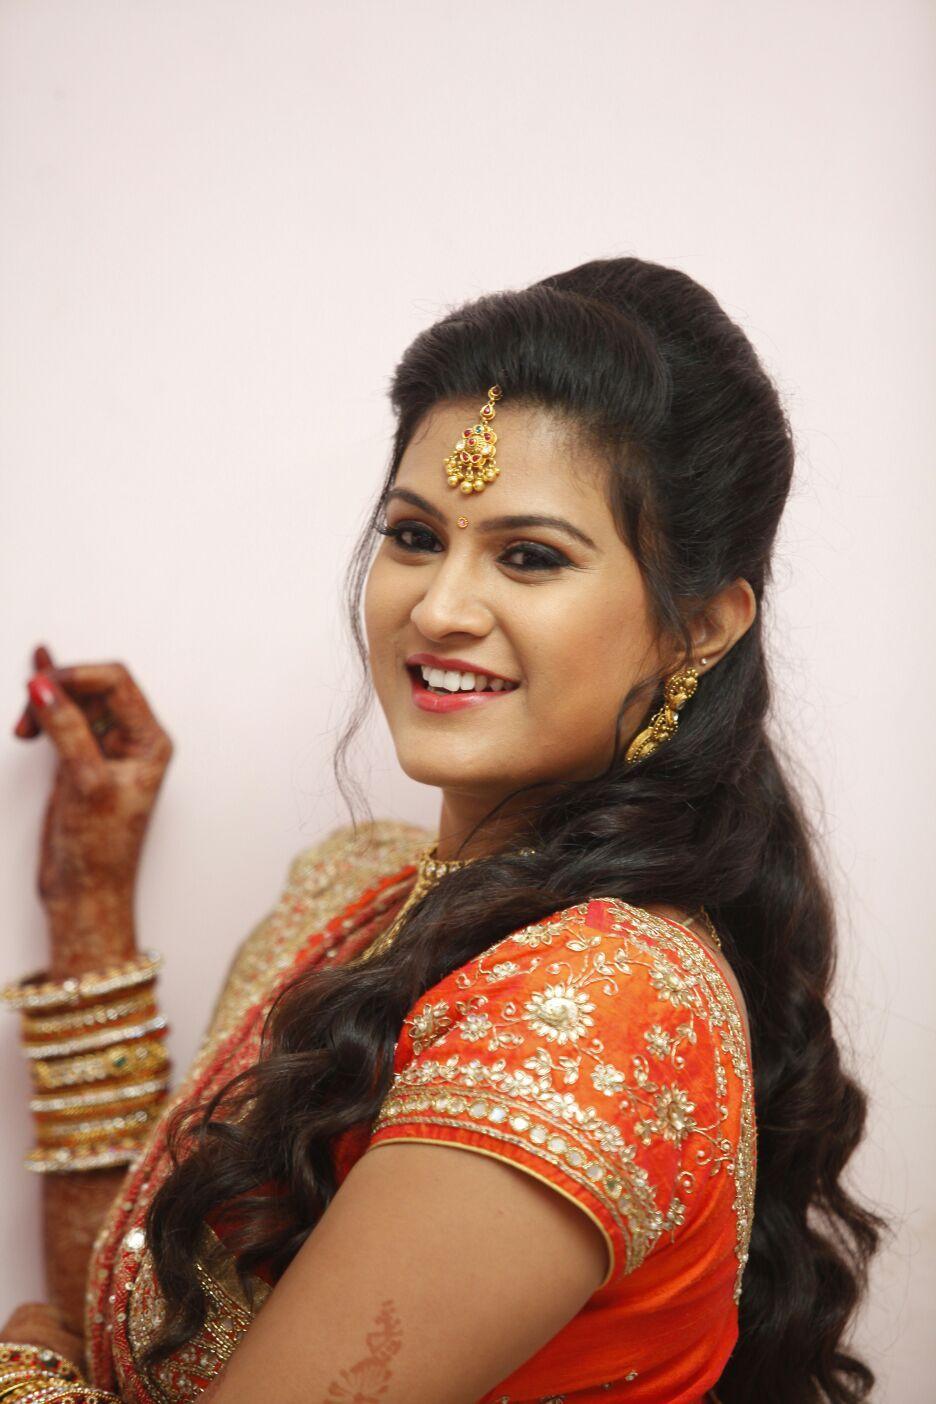 Siva Makeup Studio is leading professional makeup artist